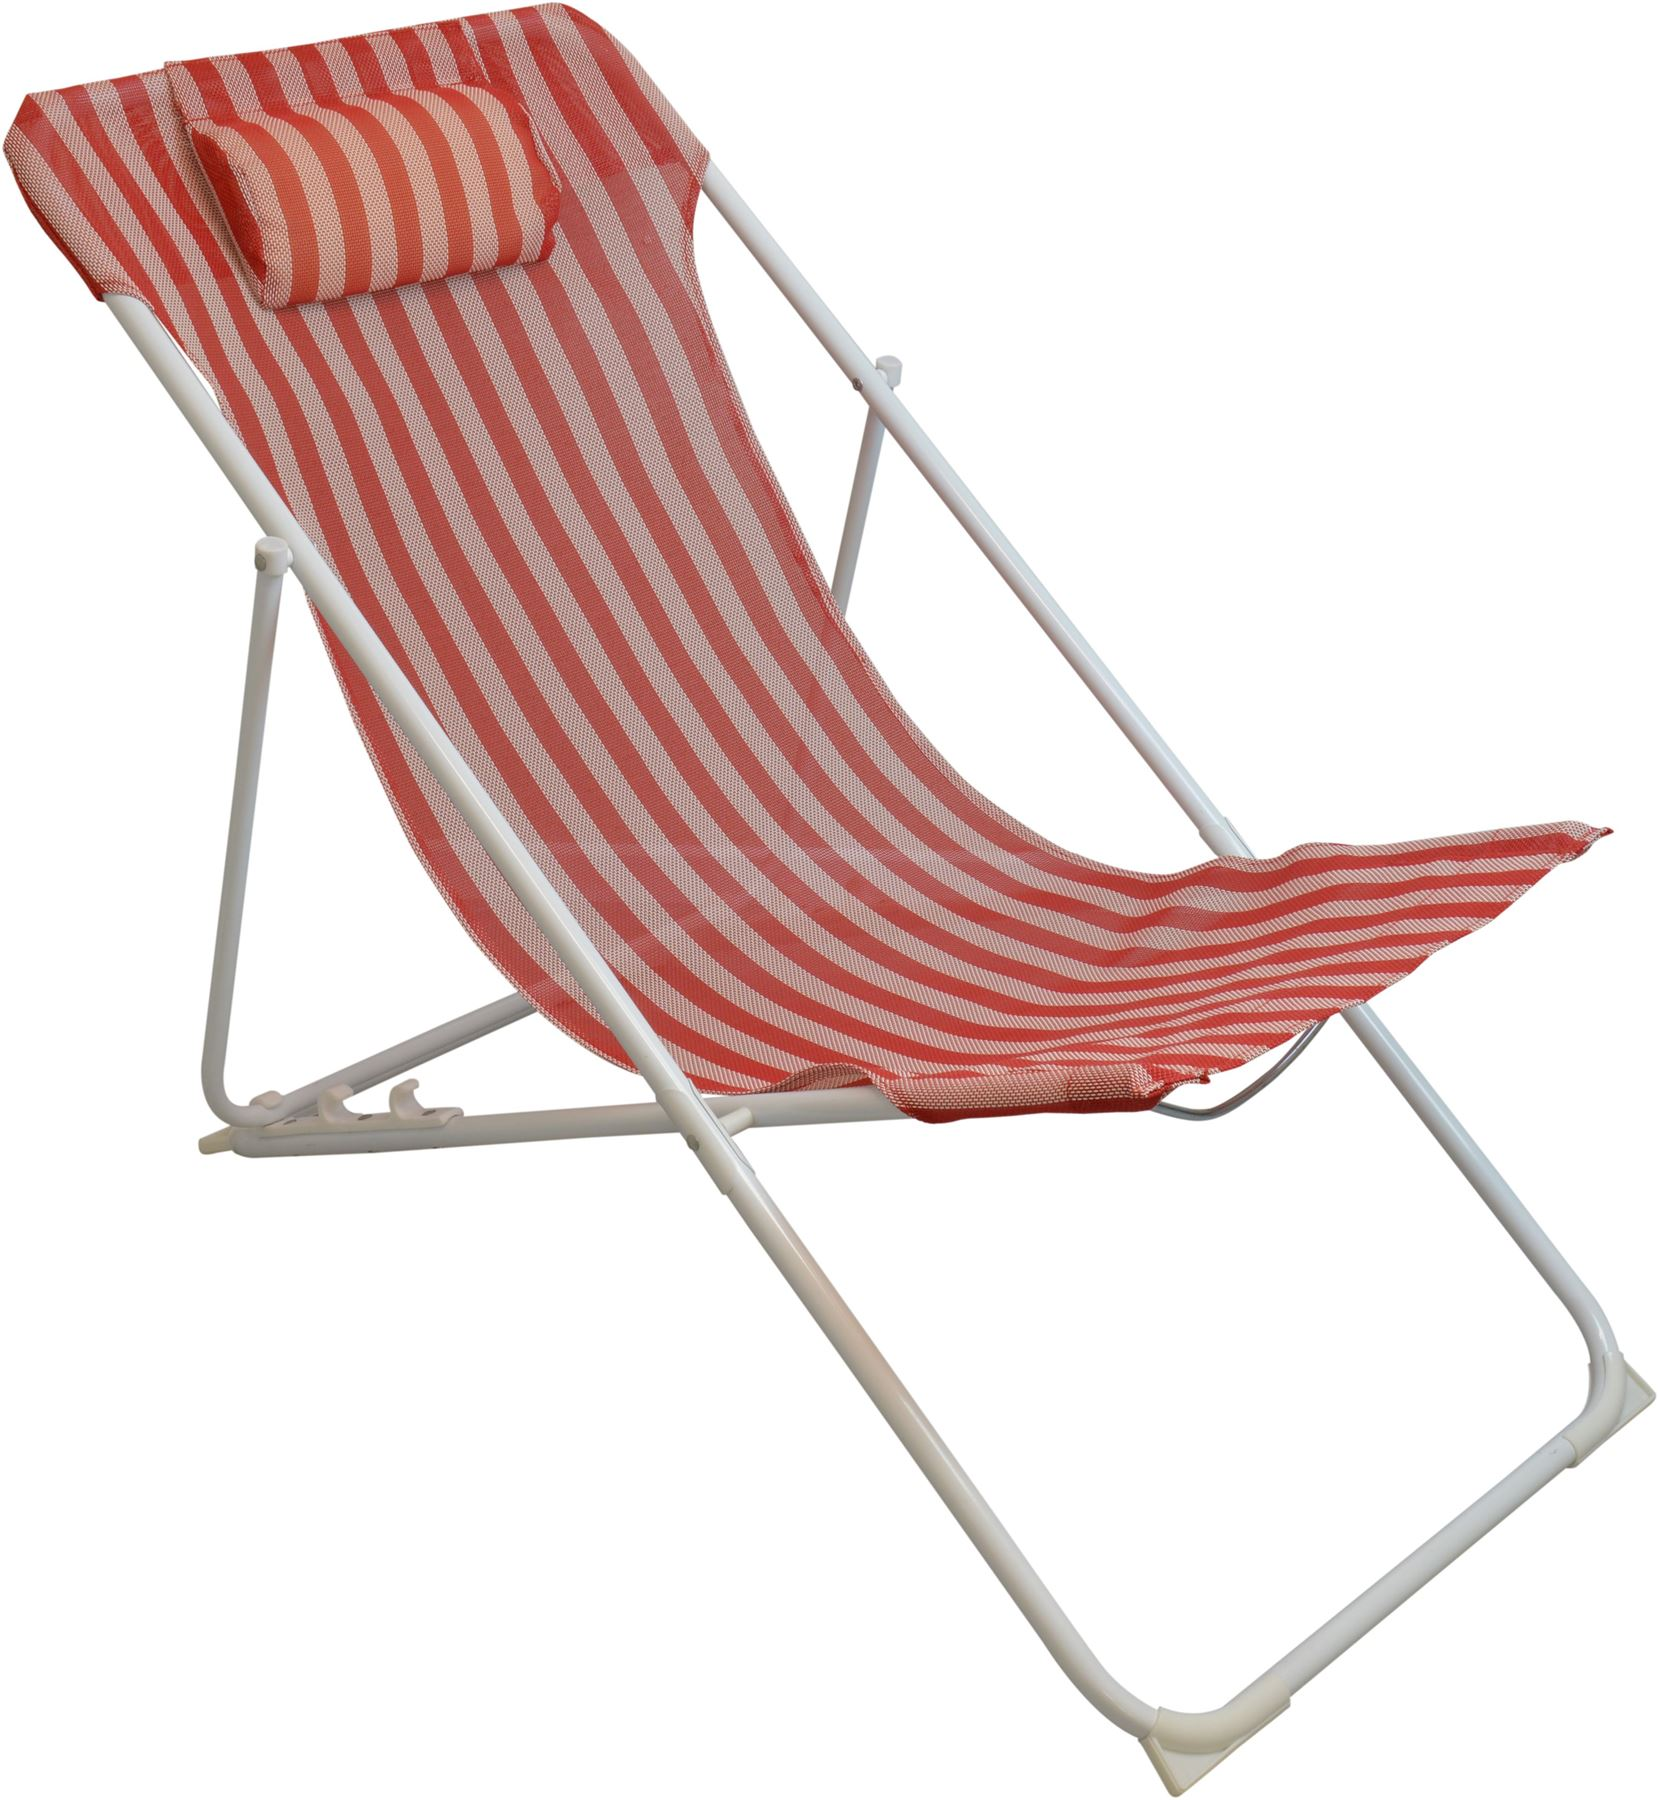 steel chair amazon tempur pedic office reviews metal deckchair garden beach seaside folding deck